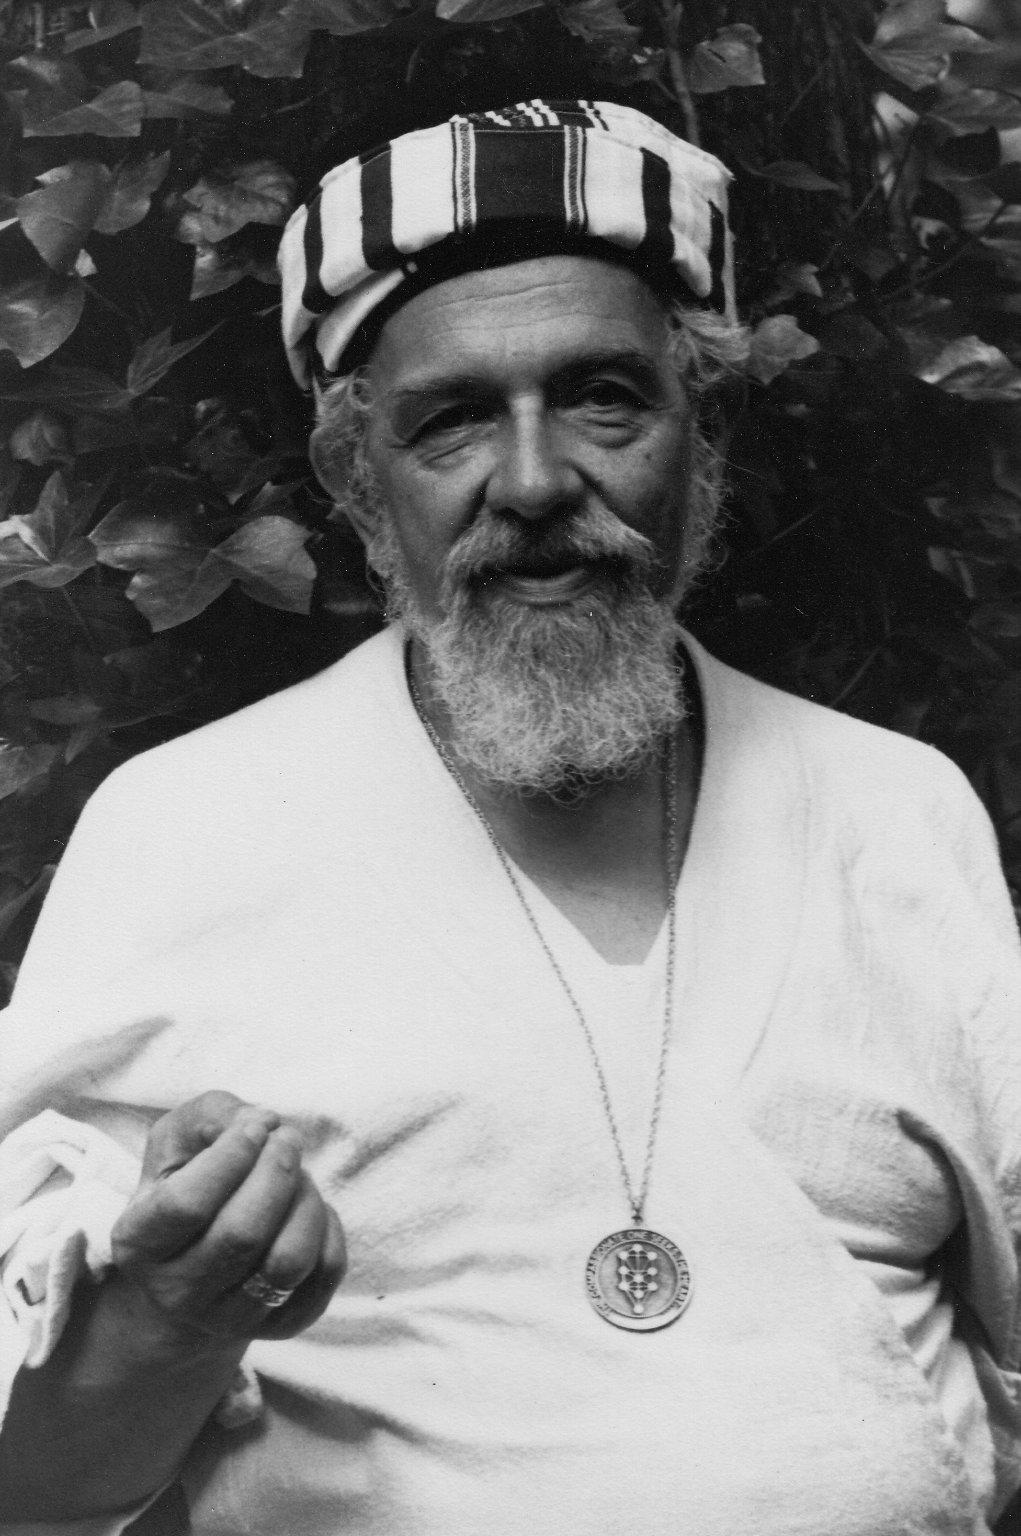 Rabbi Zalman Schachter-Shalomi in stiped turban with B'nai Or medallion, ca. 1980s.